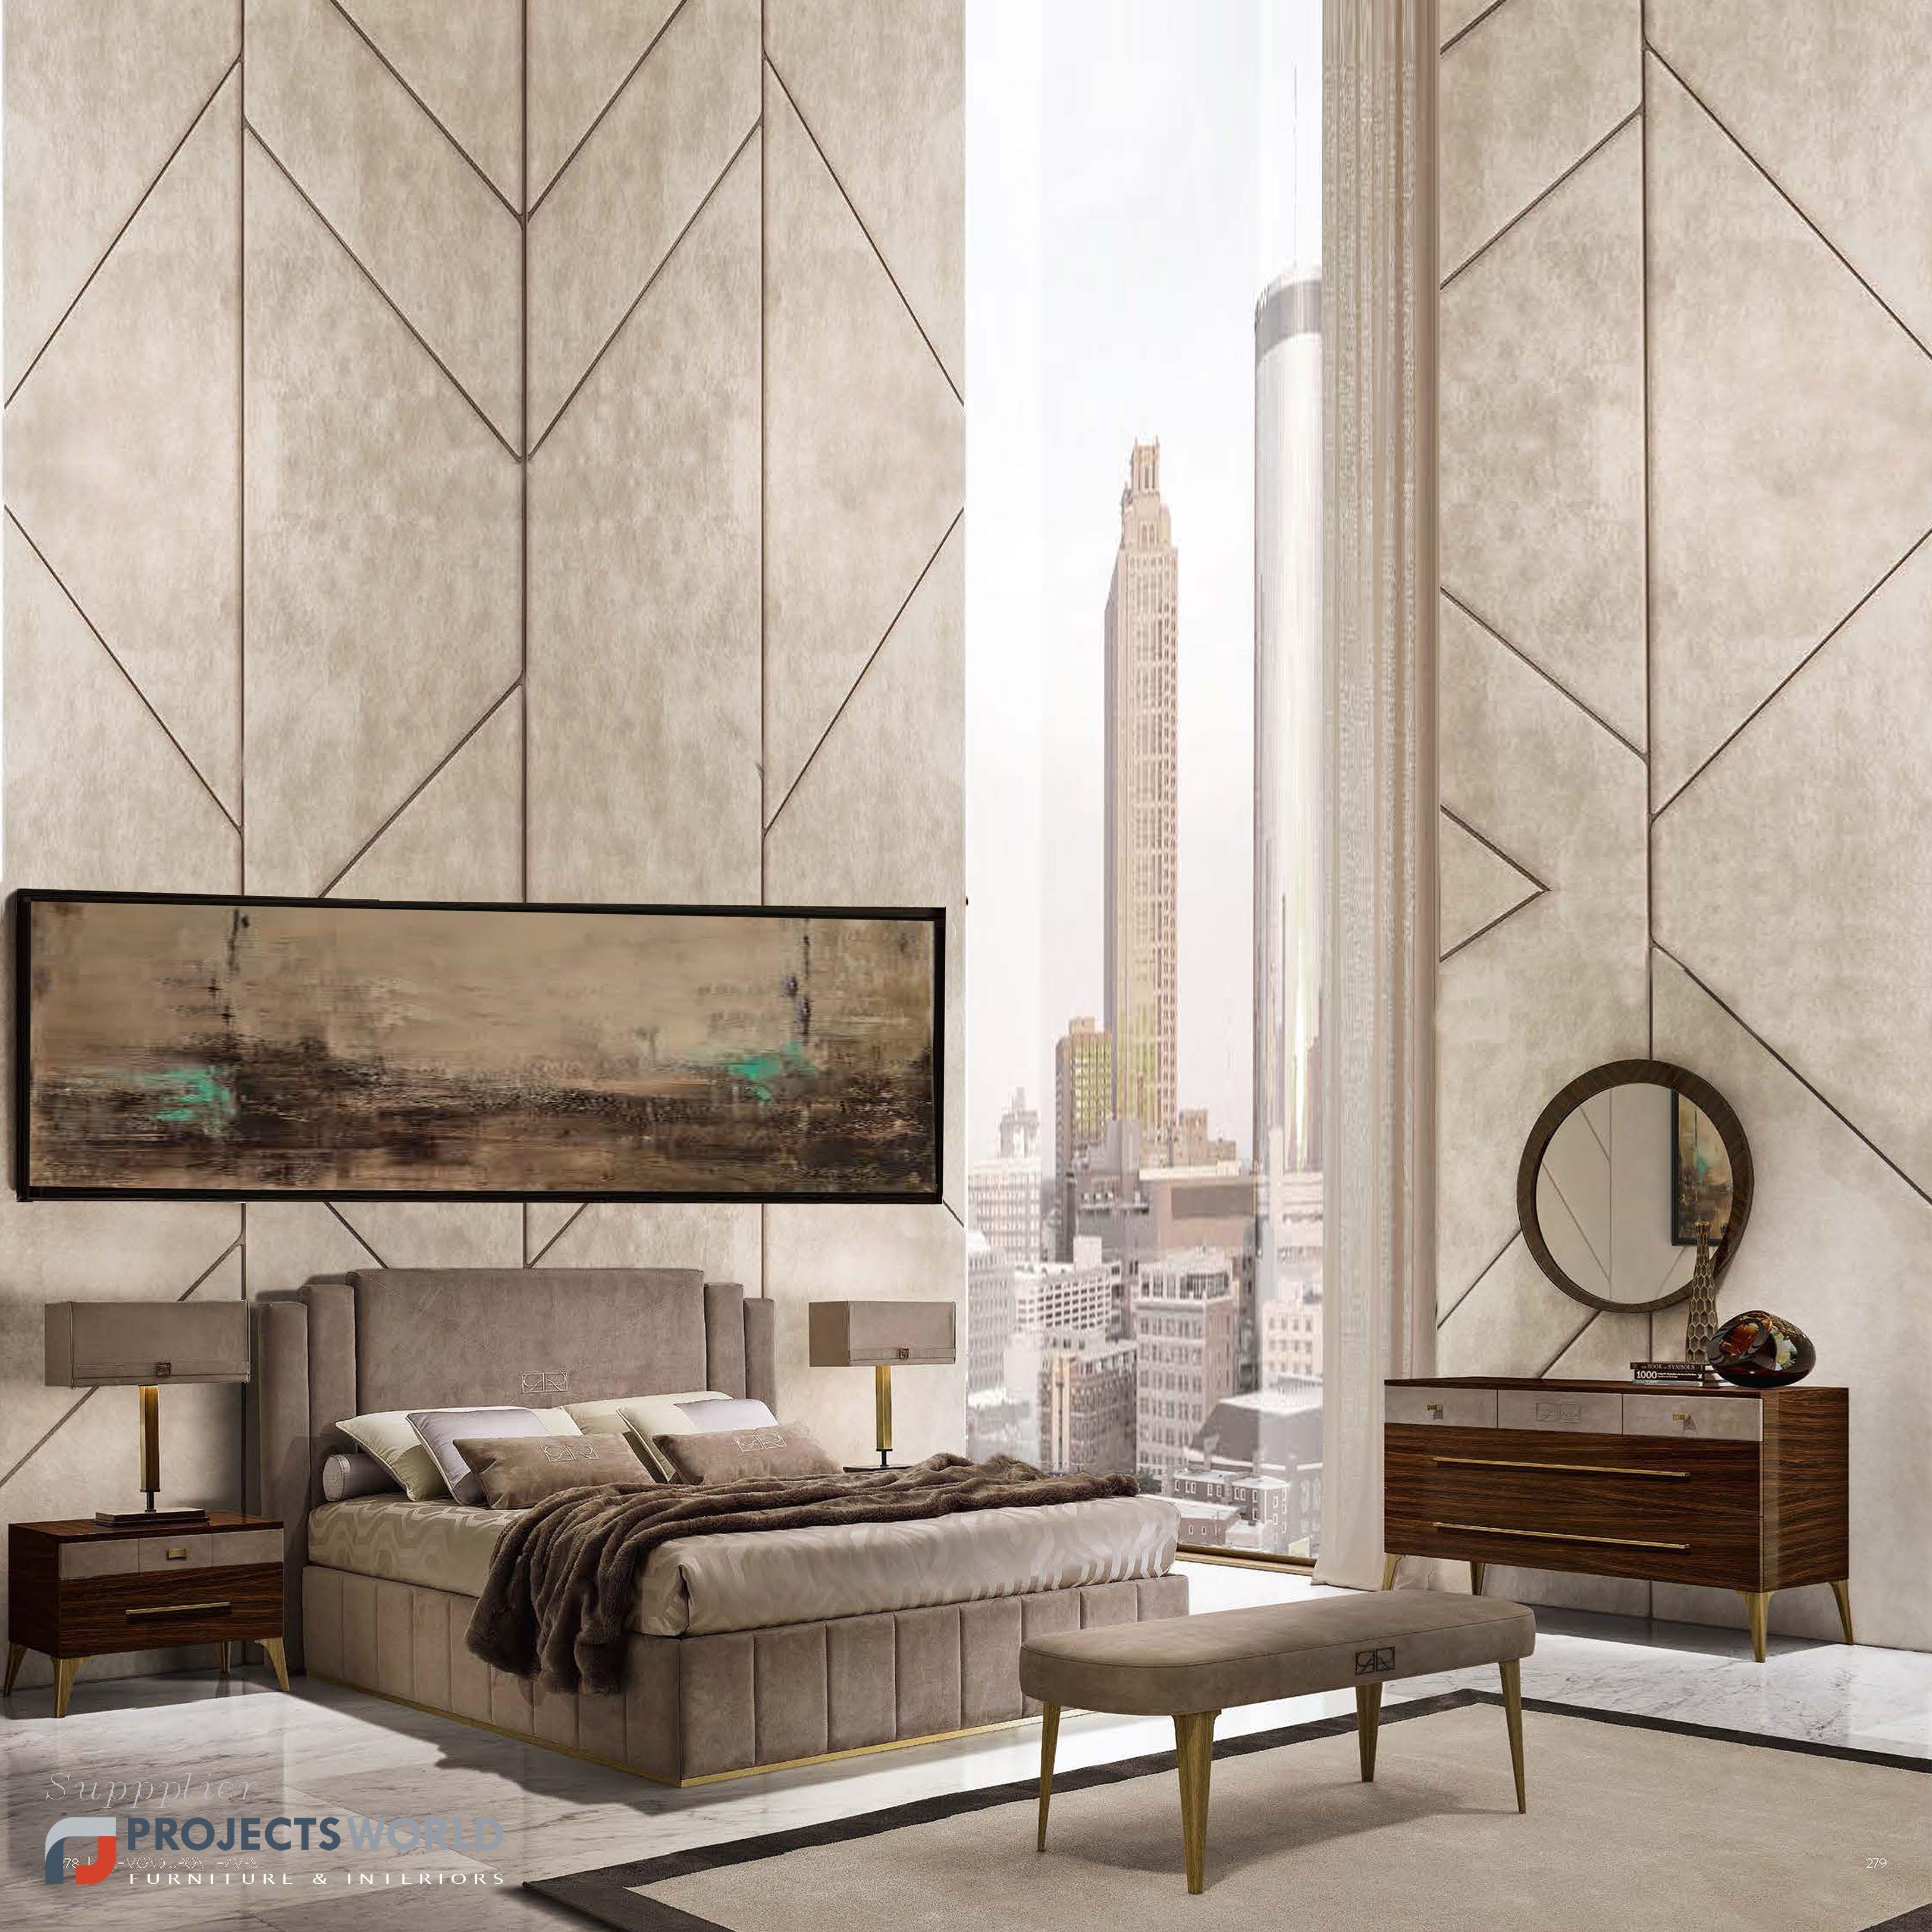 #projectsworld #furniture #european #luxury #design